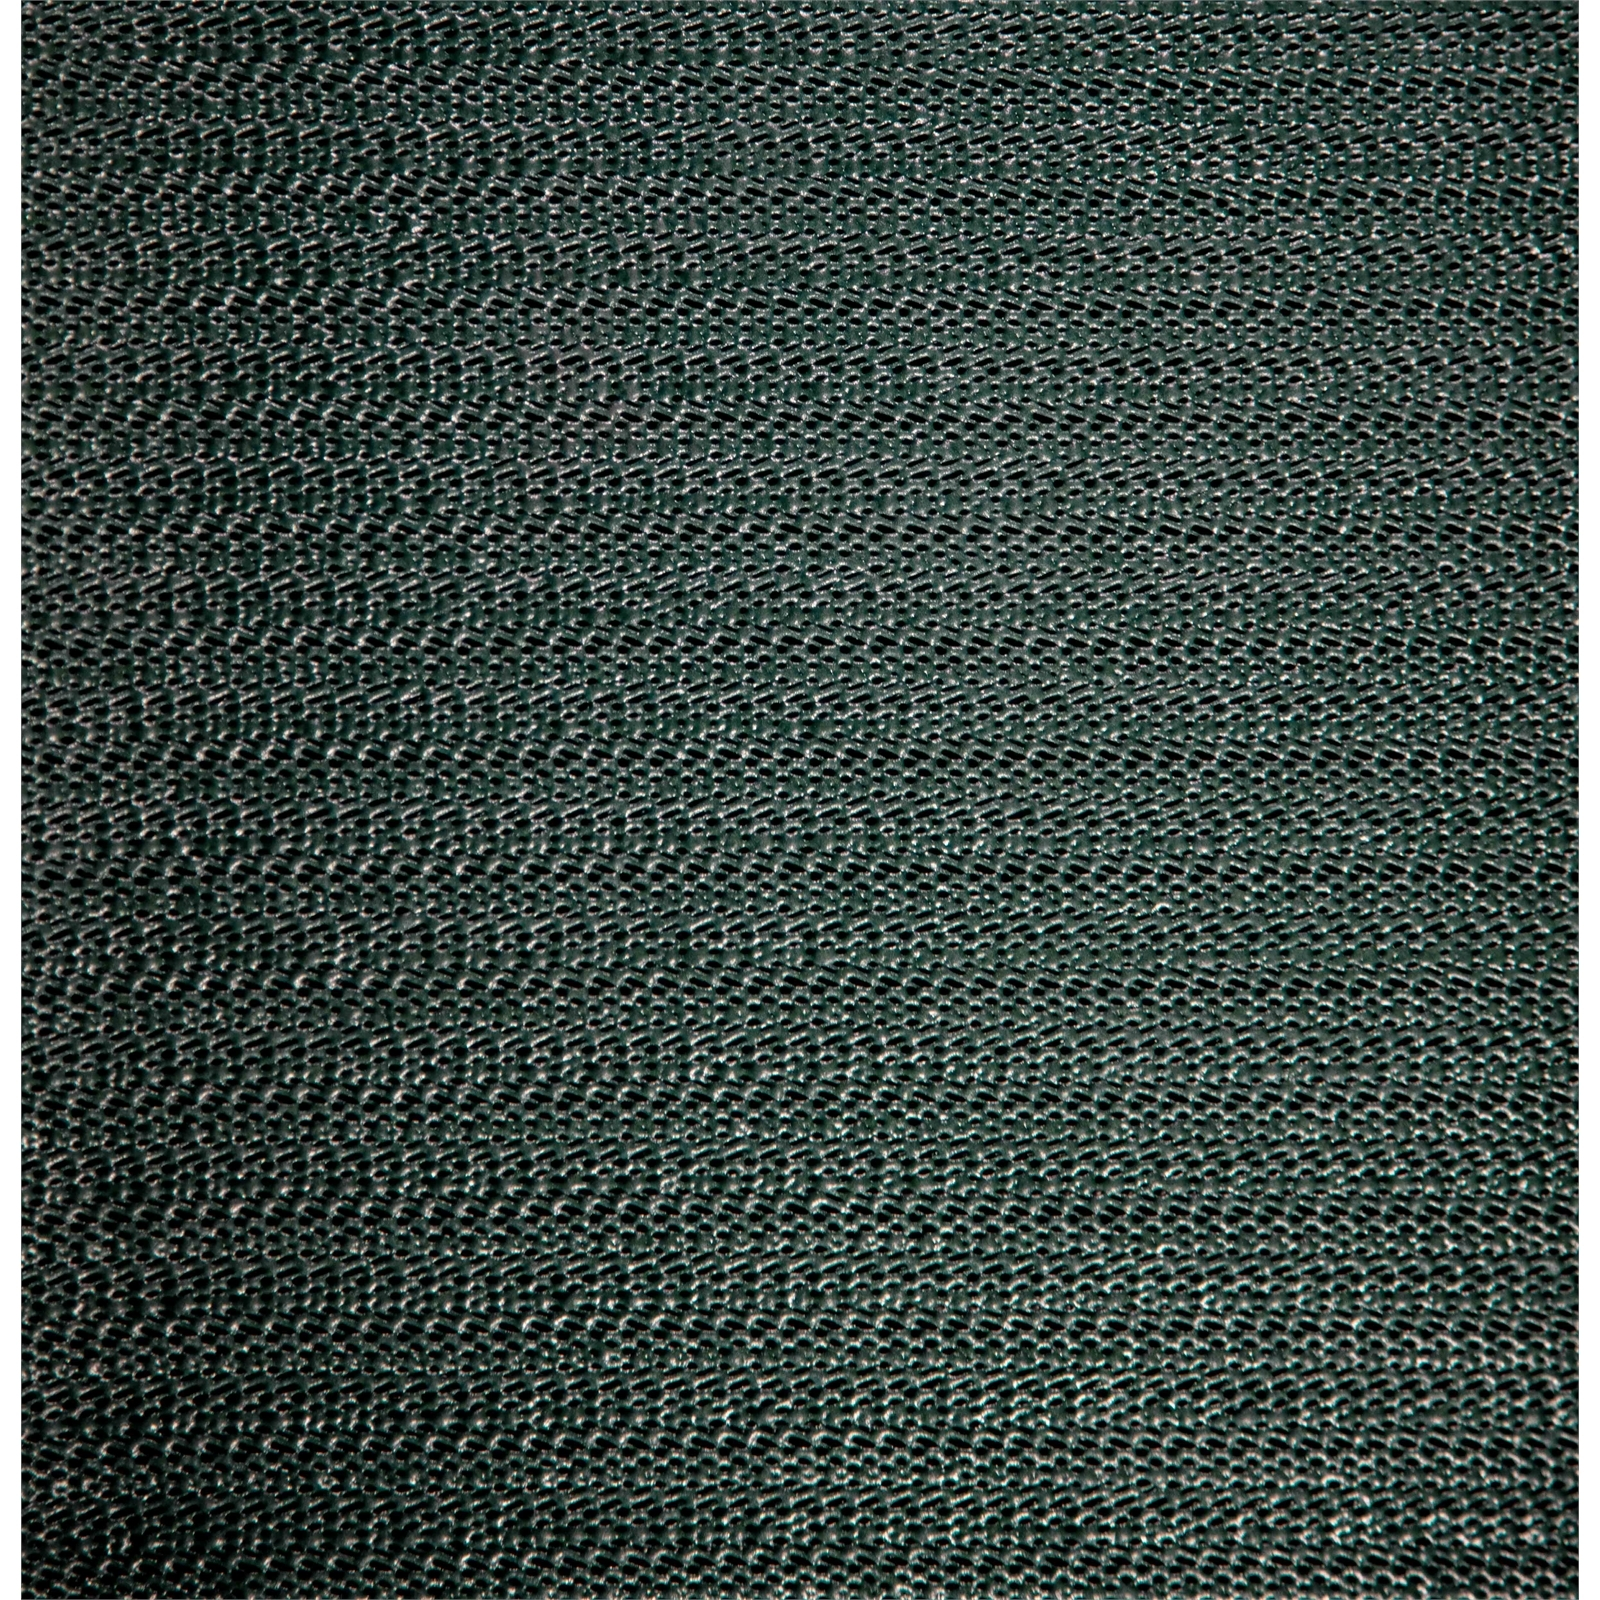 NuPlastex Magic Stop 90cm Federation Green Non Slip Matting